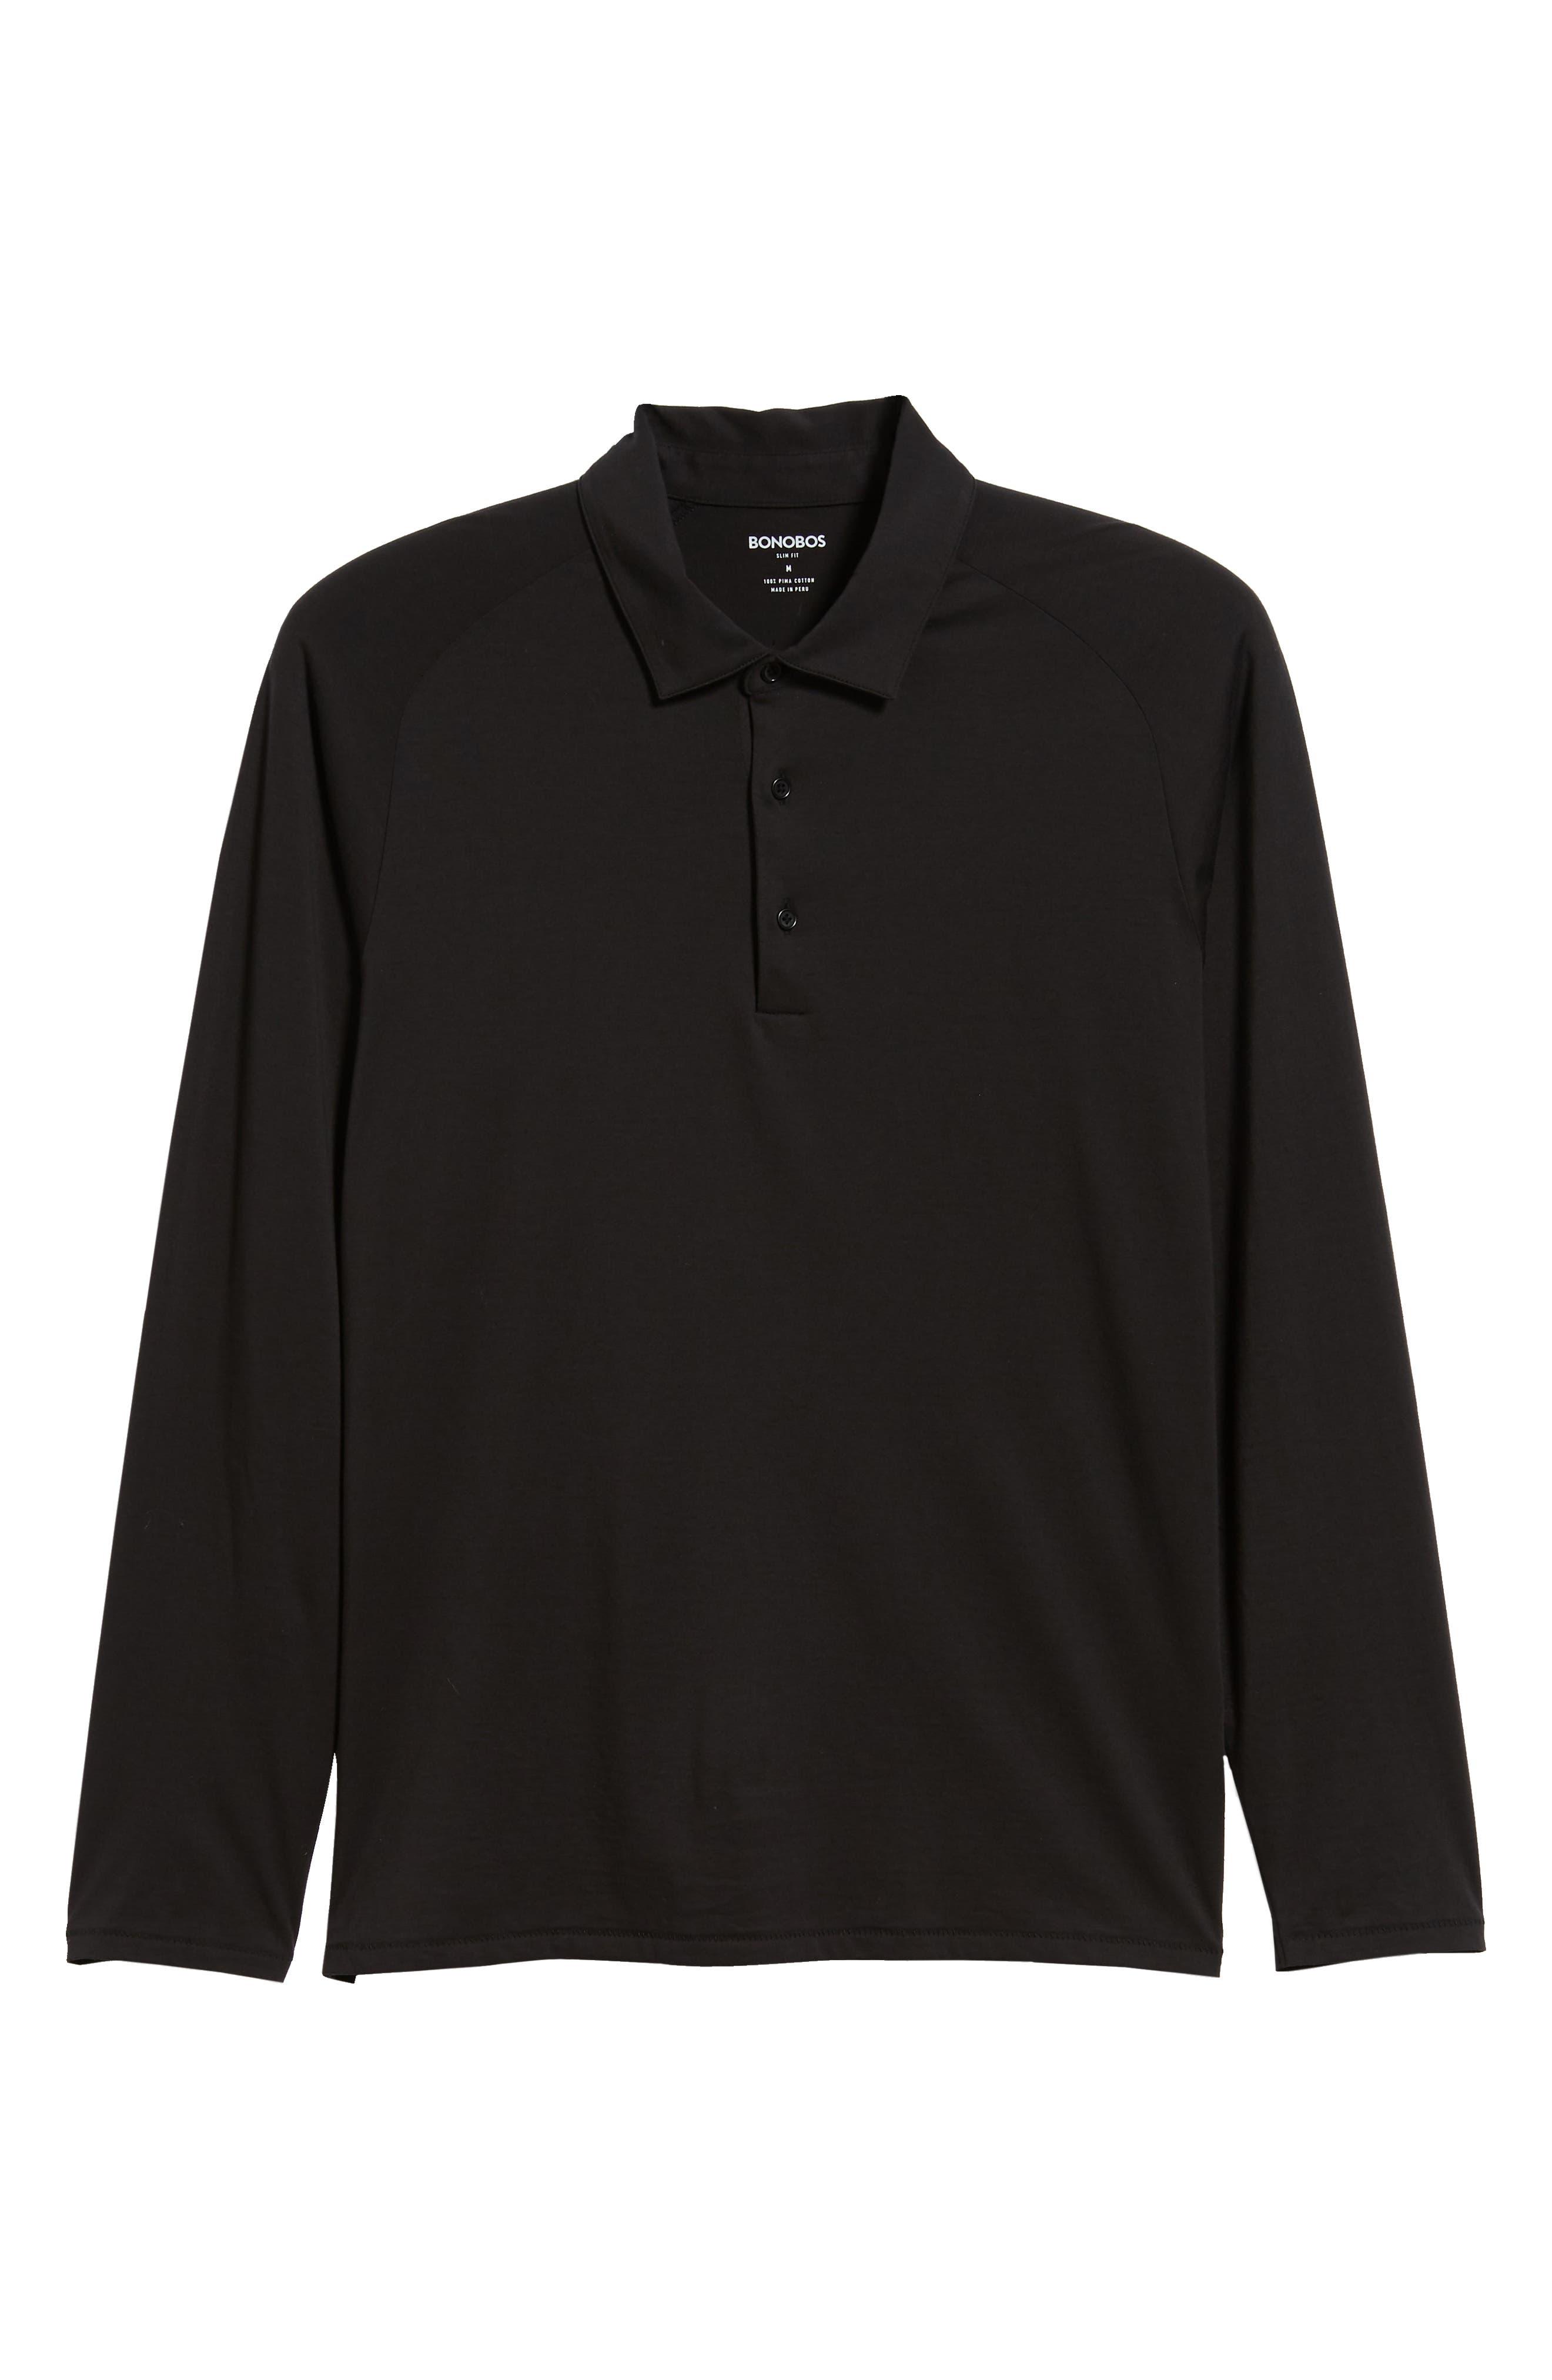 Superfine Slim Fit Long Sleeve Polo,                             Alternate thumbnail 6, color,                             CAVIAR BLACK